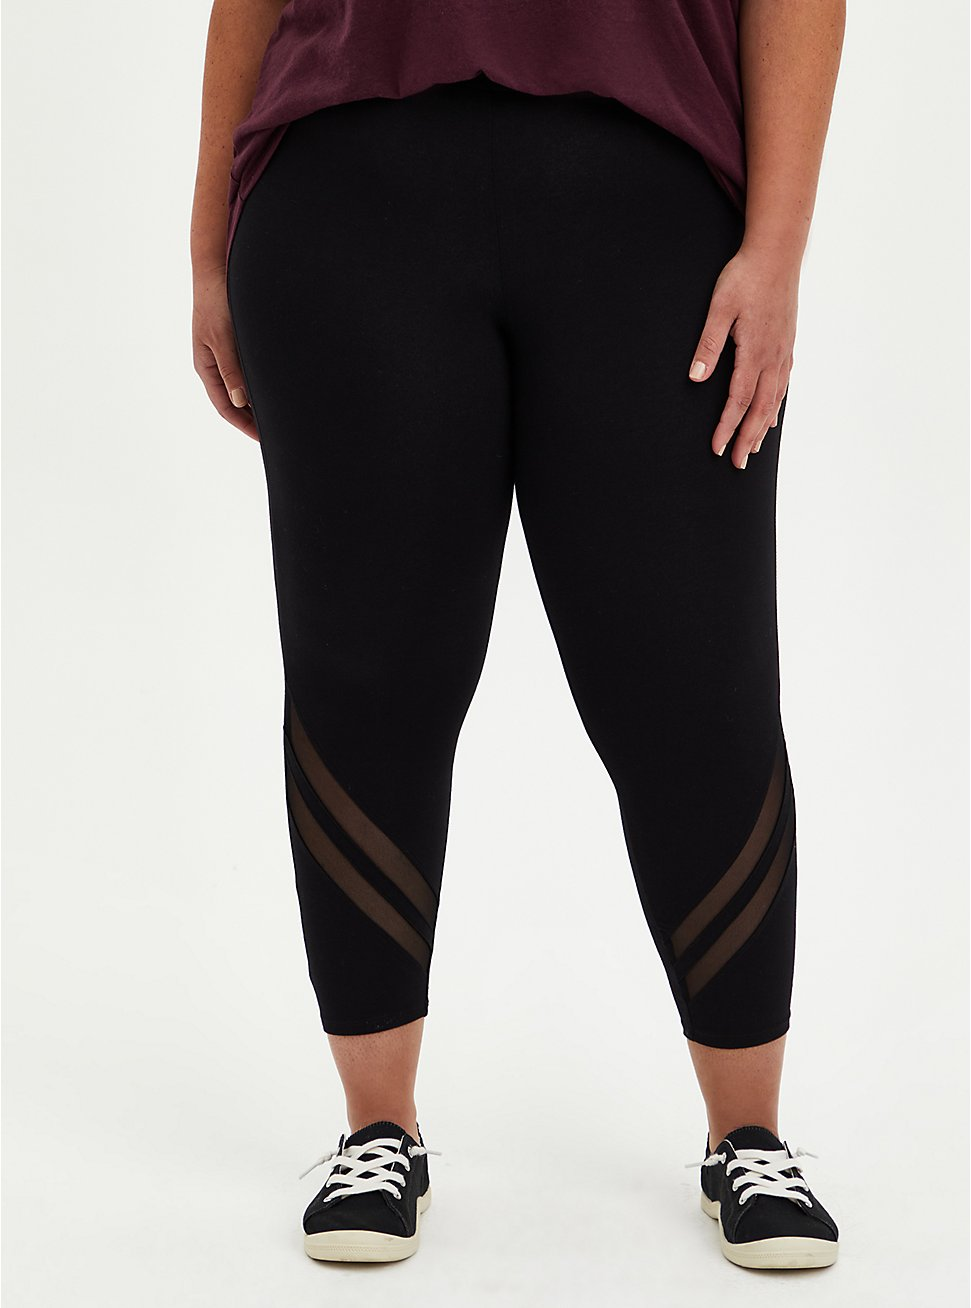 Crop Premium Legging - Mesh Back Stripe Black, BLACK, hi-res